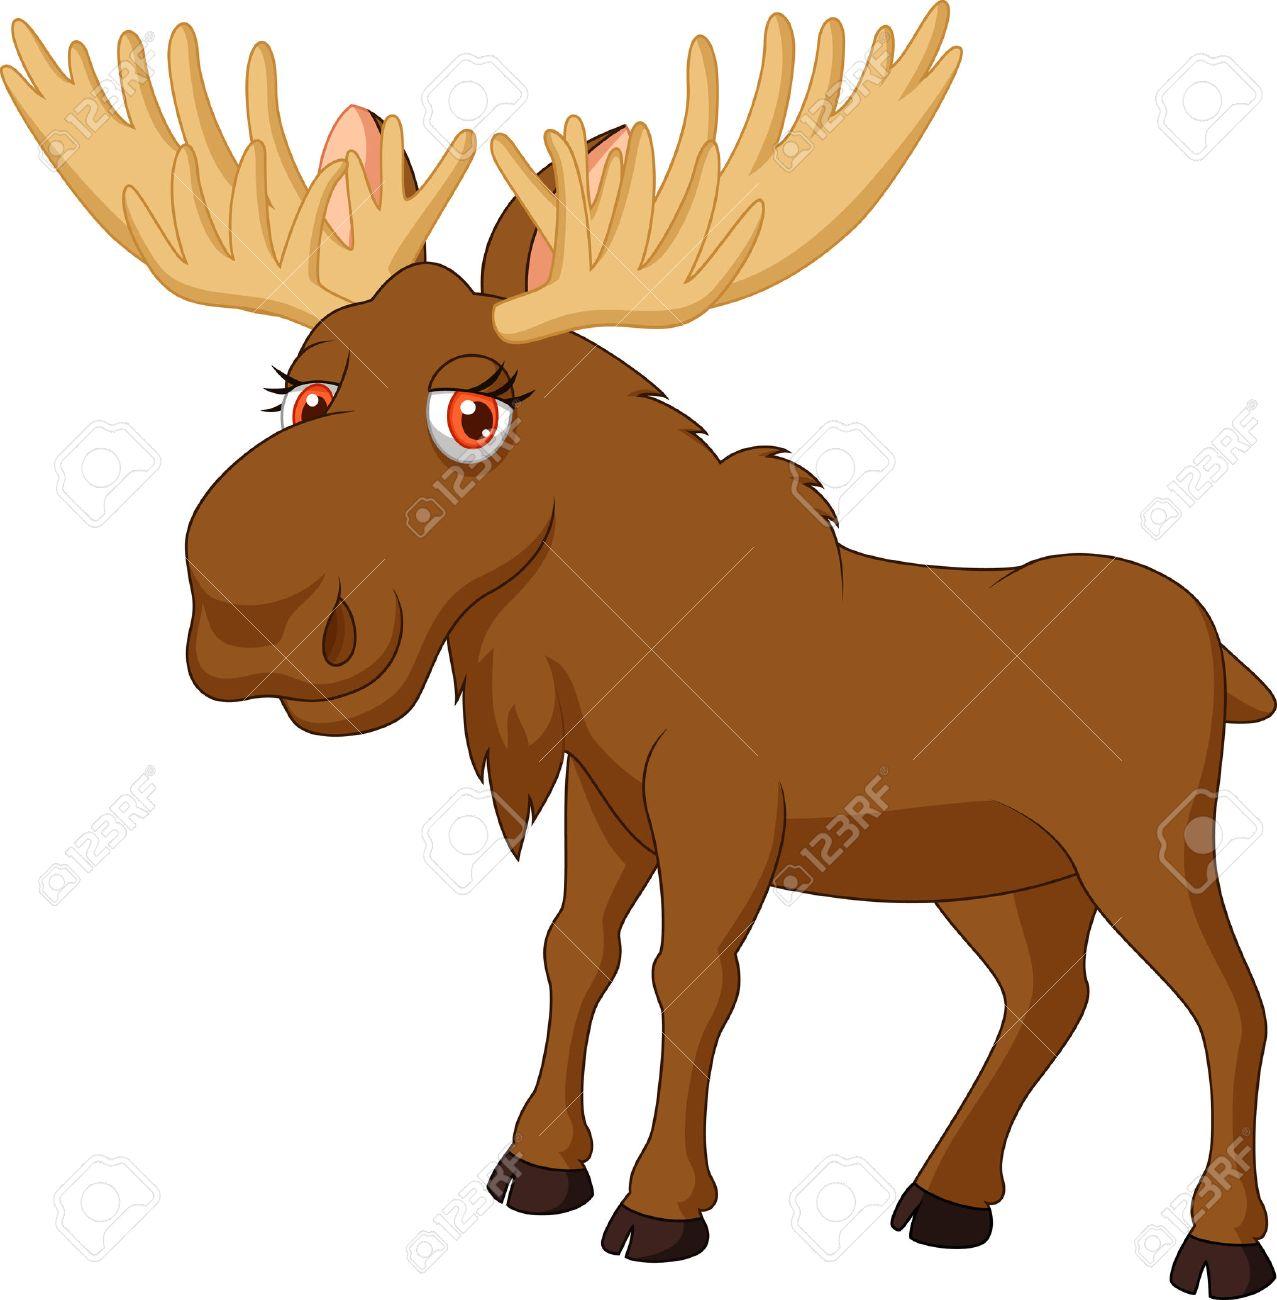 moose cartoon images u0026 stock pictures royalty free moose cartoon